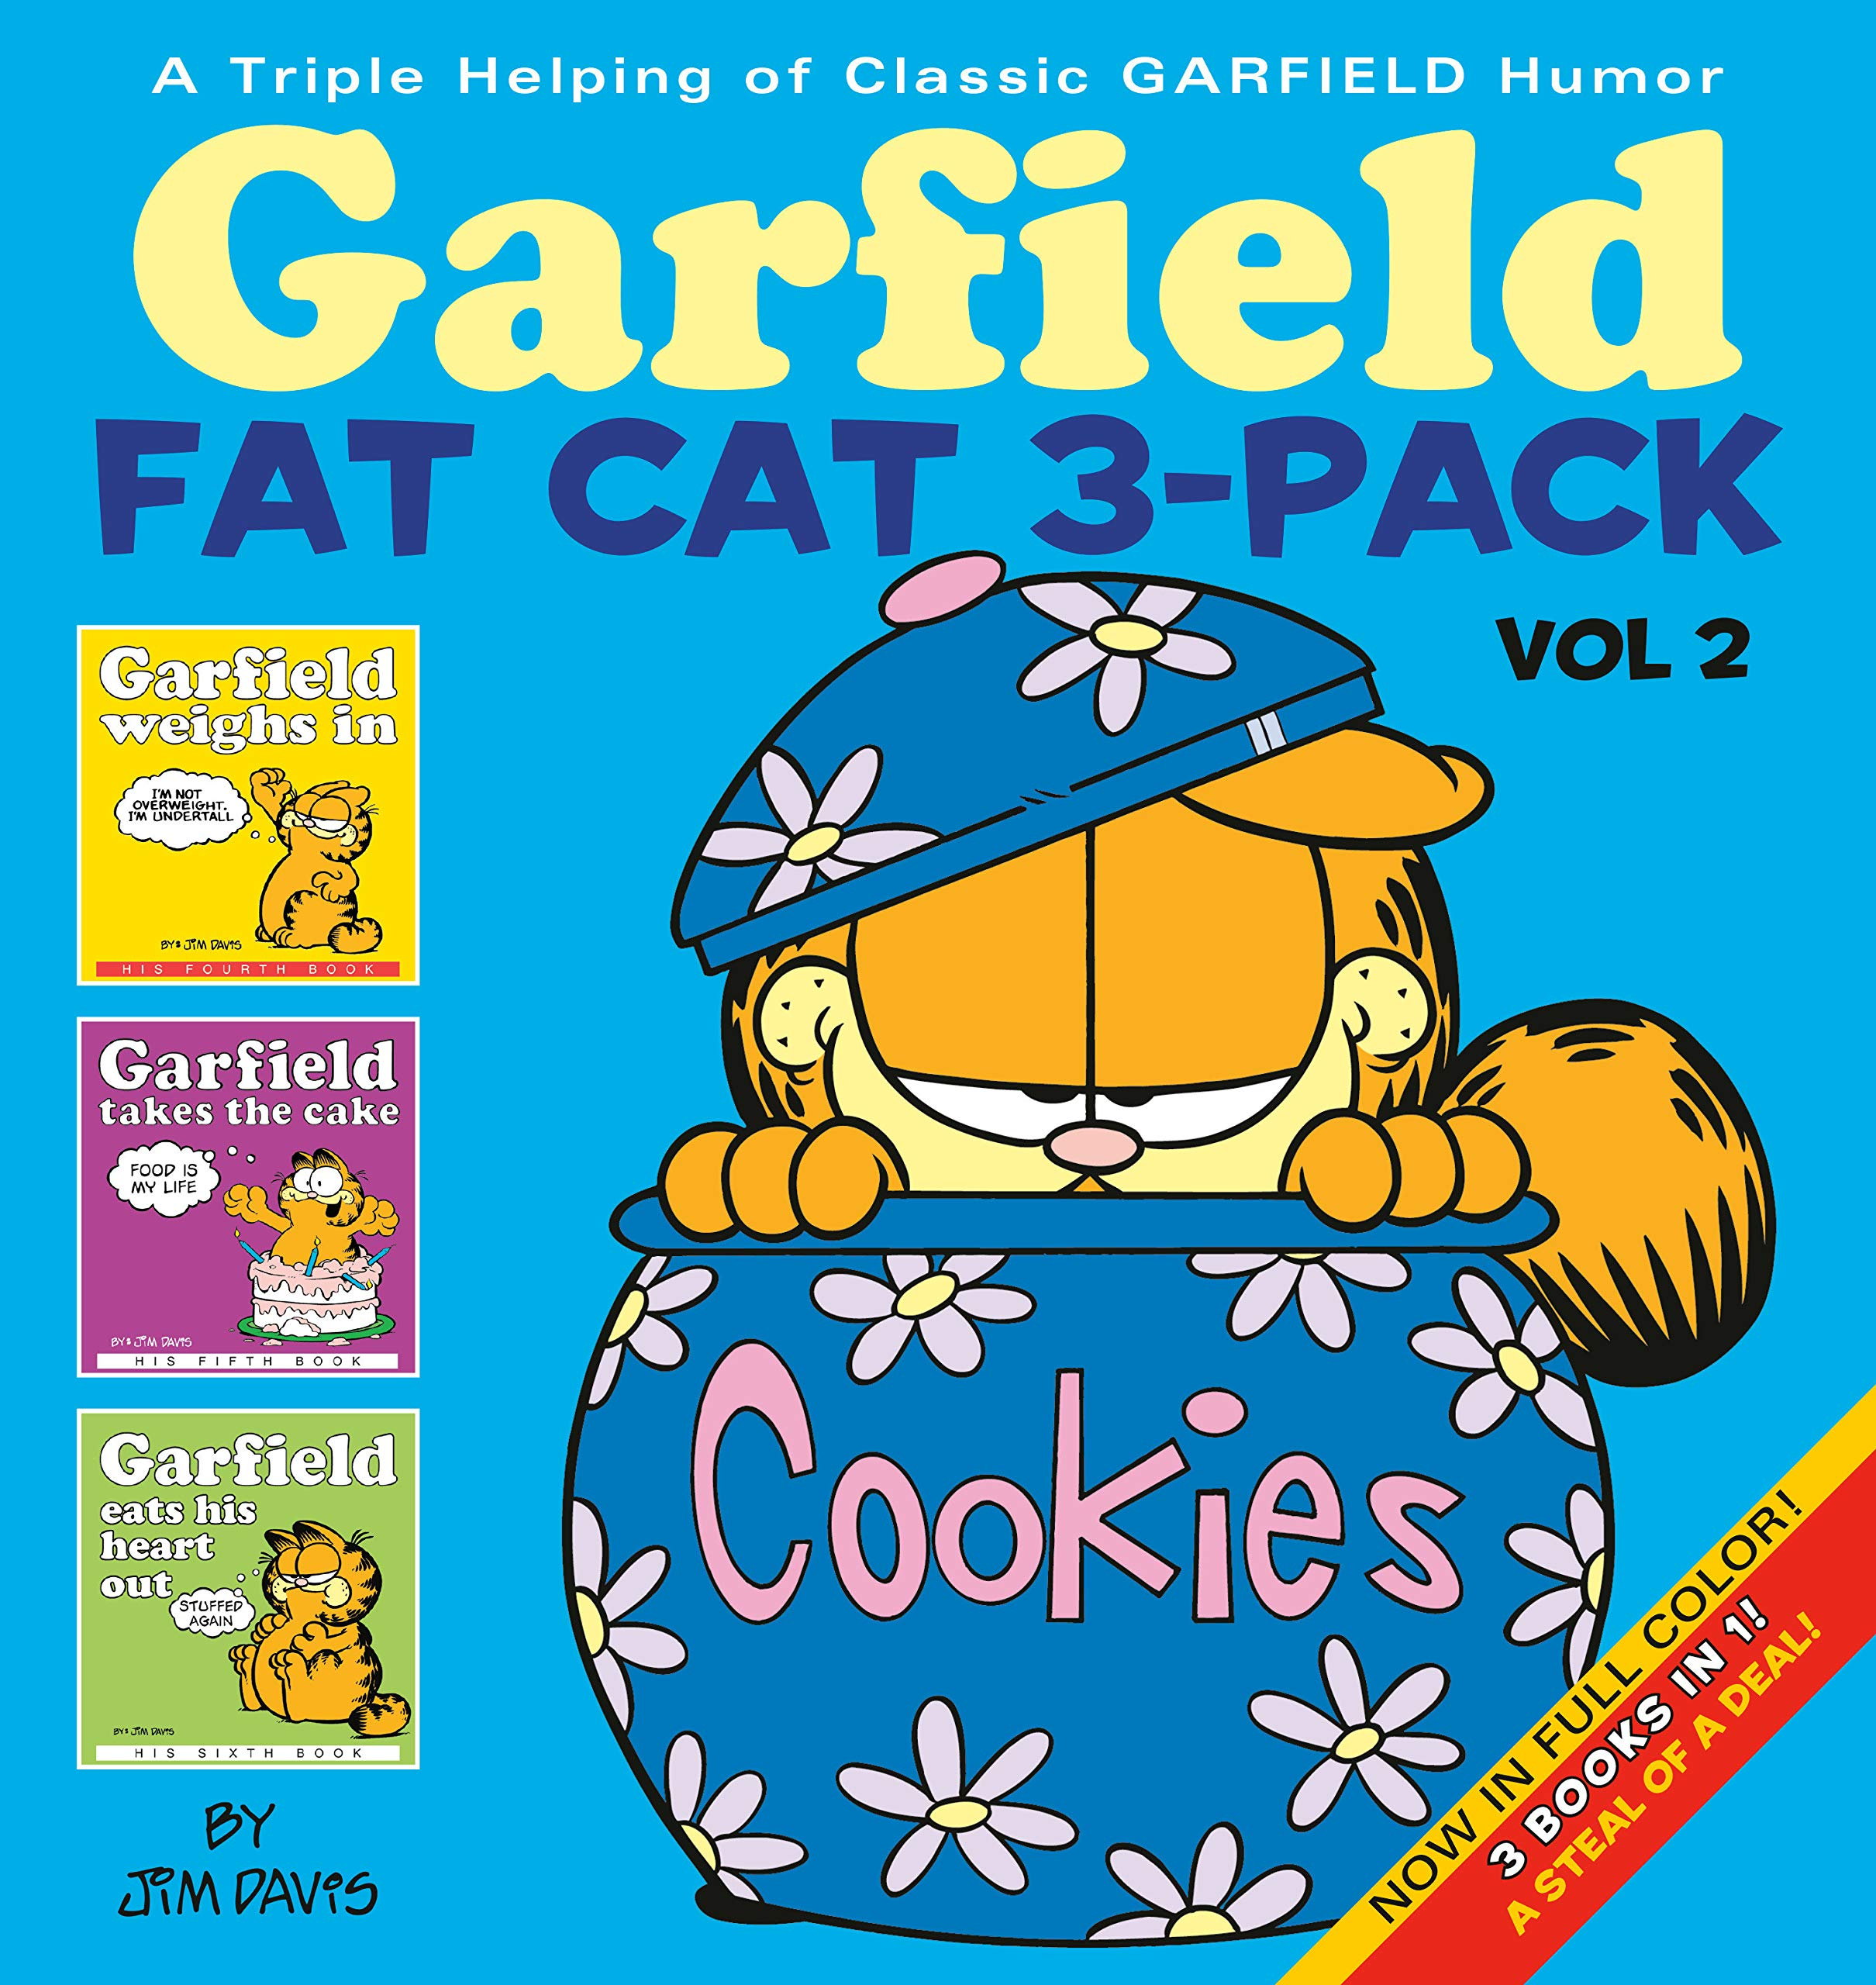 Garfield Fat Cat 3 Pack Vol 2 A Triple Helping Of Classic Garfield Humor Davis Jim 9780345464651 Amazon Com Books